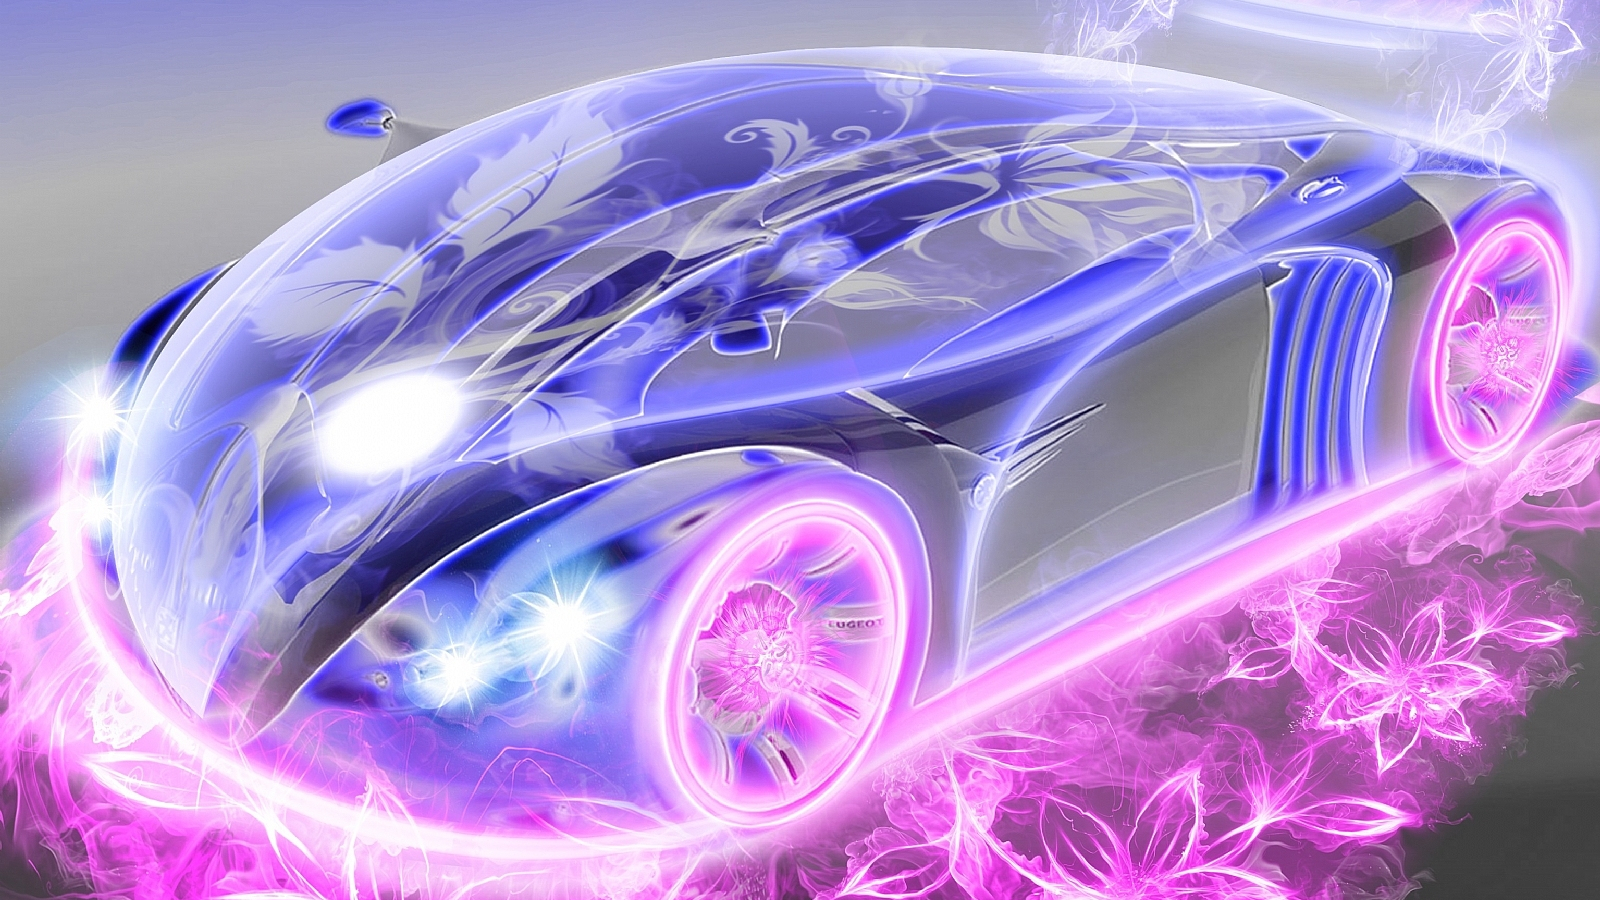 Free Download Hd 1600x1200 Cool Color Car Design Desktop Wallpapers Backgrounds 1600x1200 For Your Desktop Mobile Tablet Explore 74 Cool Color Backgrounds Cool Color Wallpaper Cool Colorful Wallpaper Backgrounds